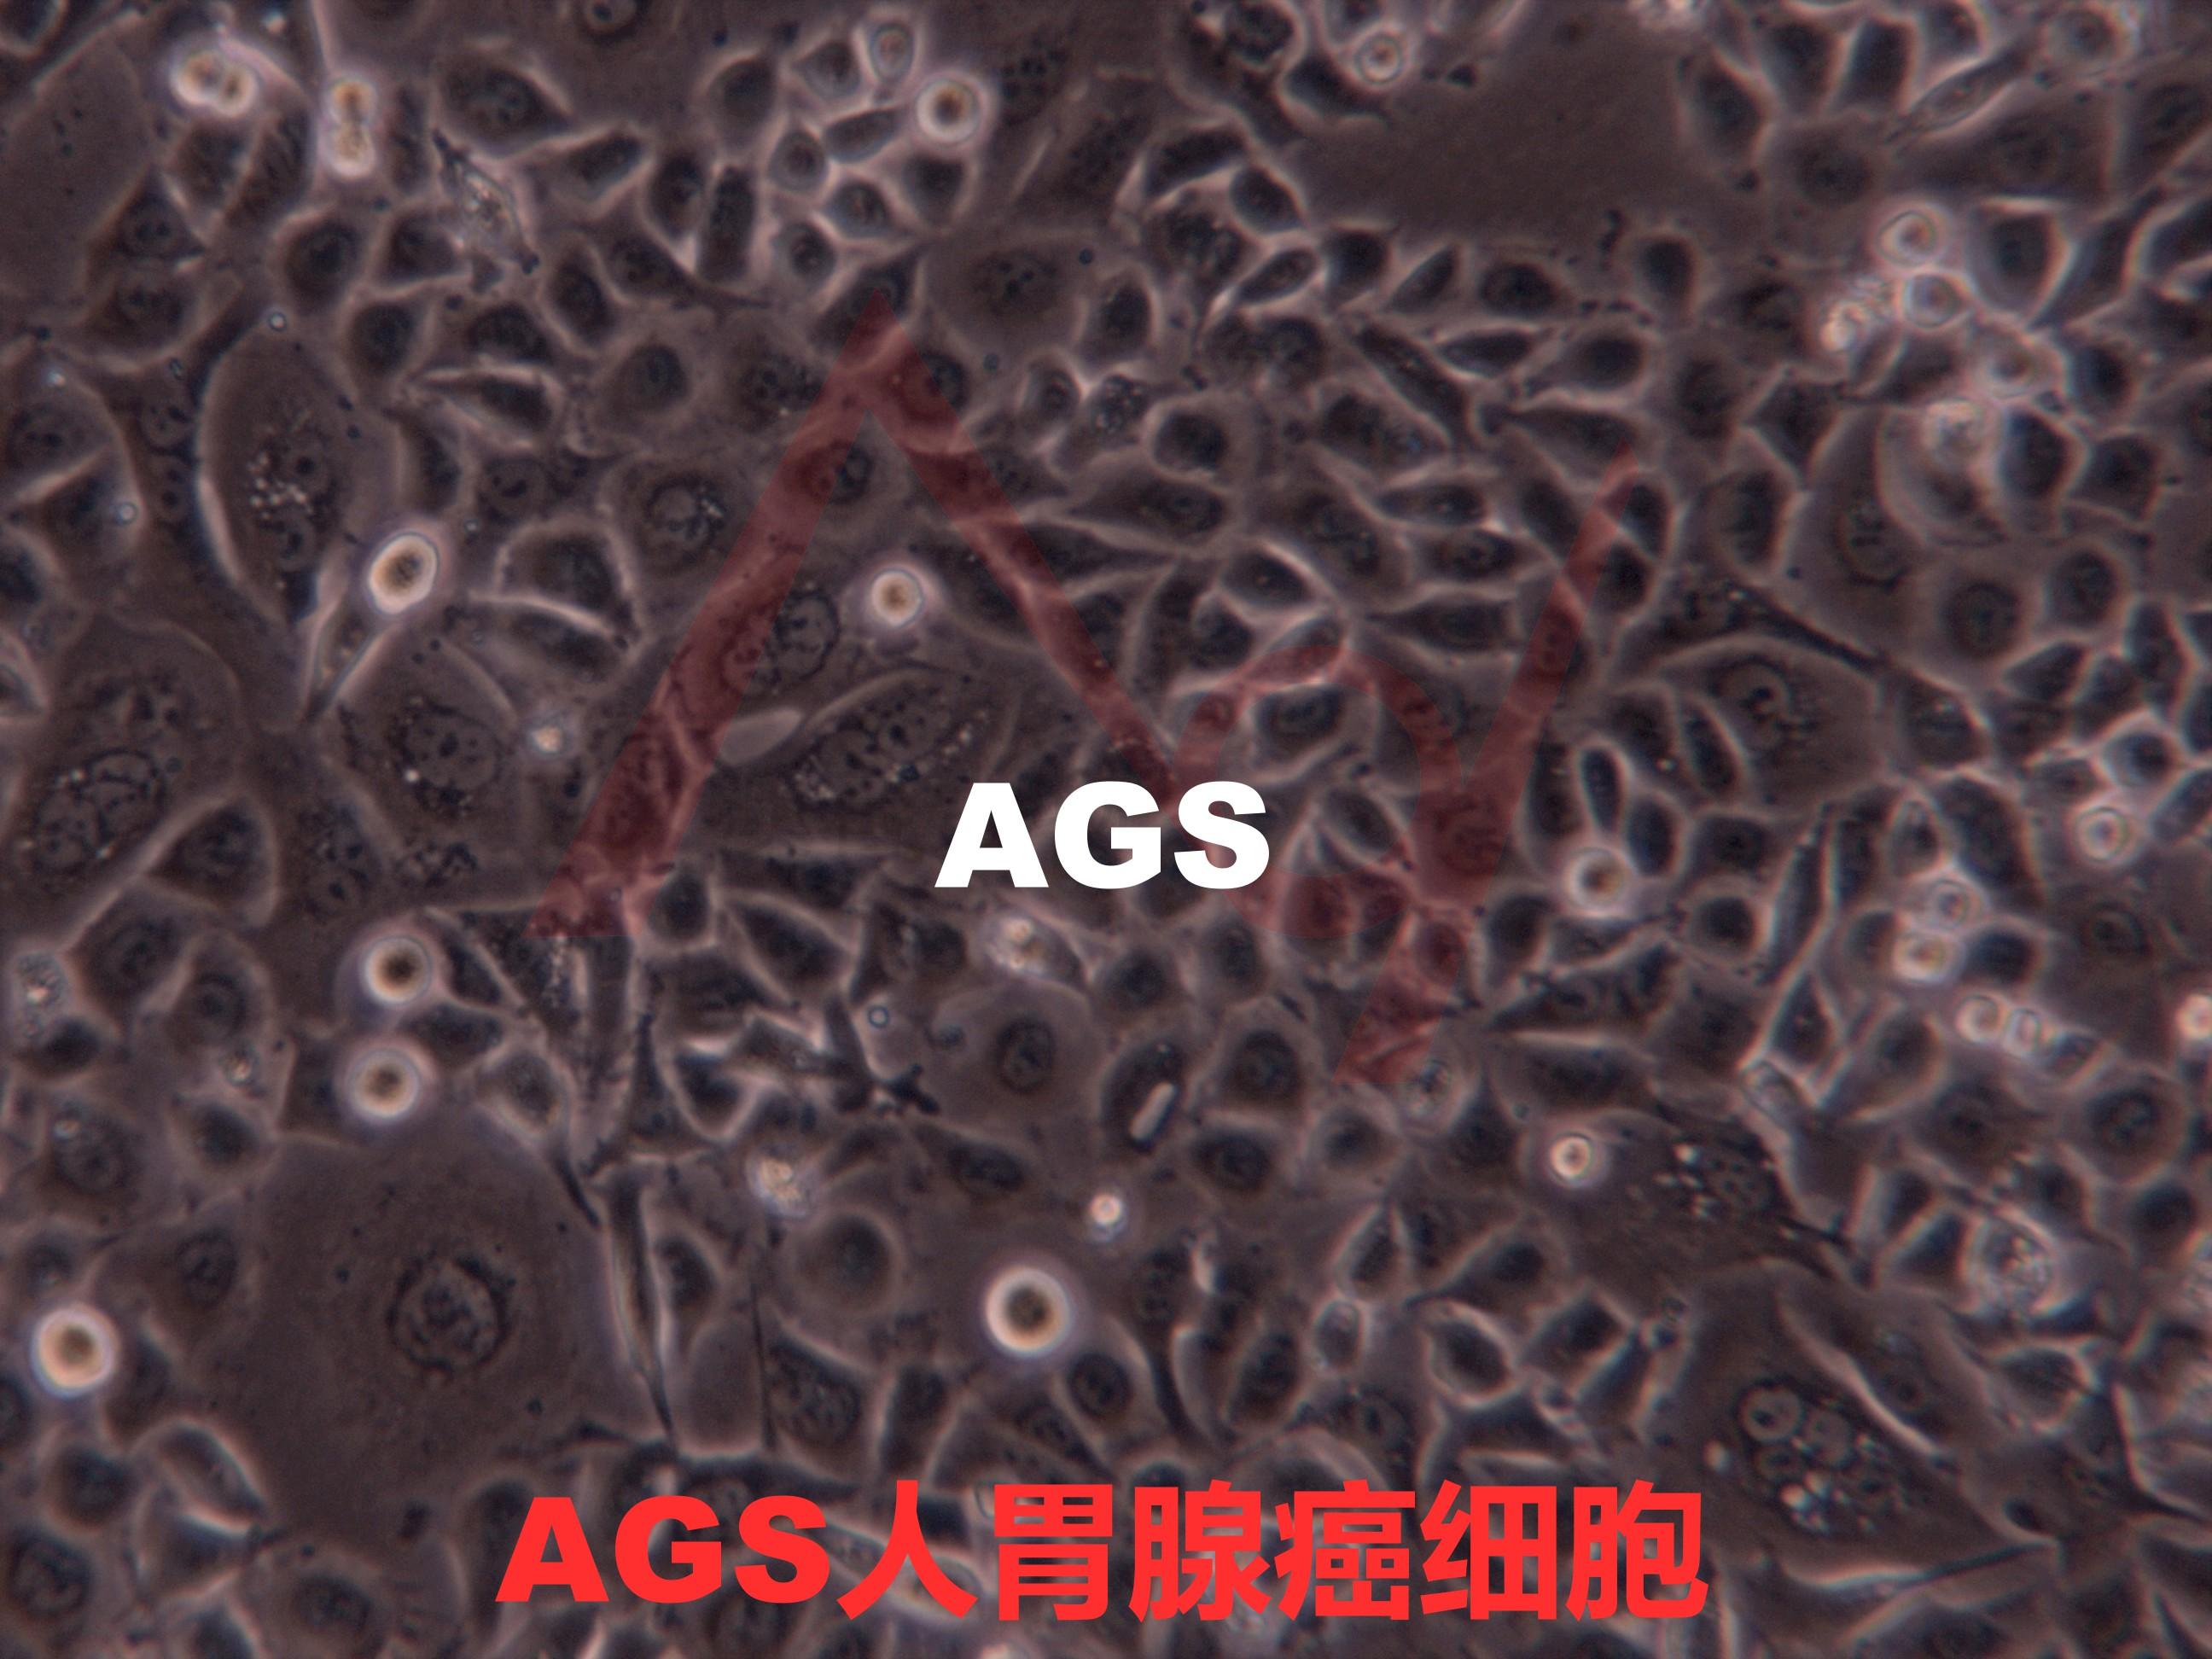 AGS AGS细胞 人胃腺癌细胞